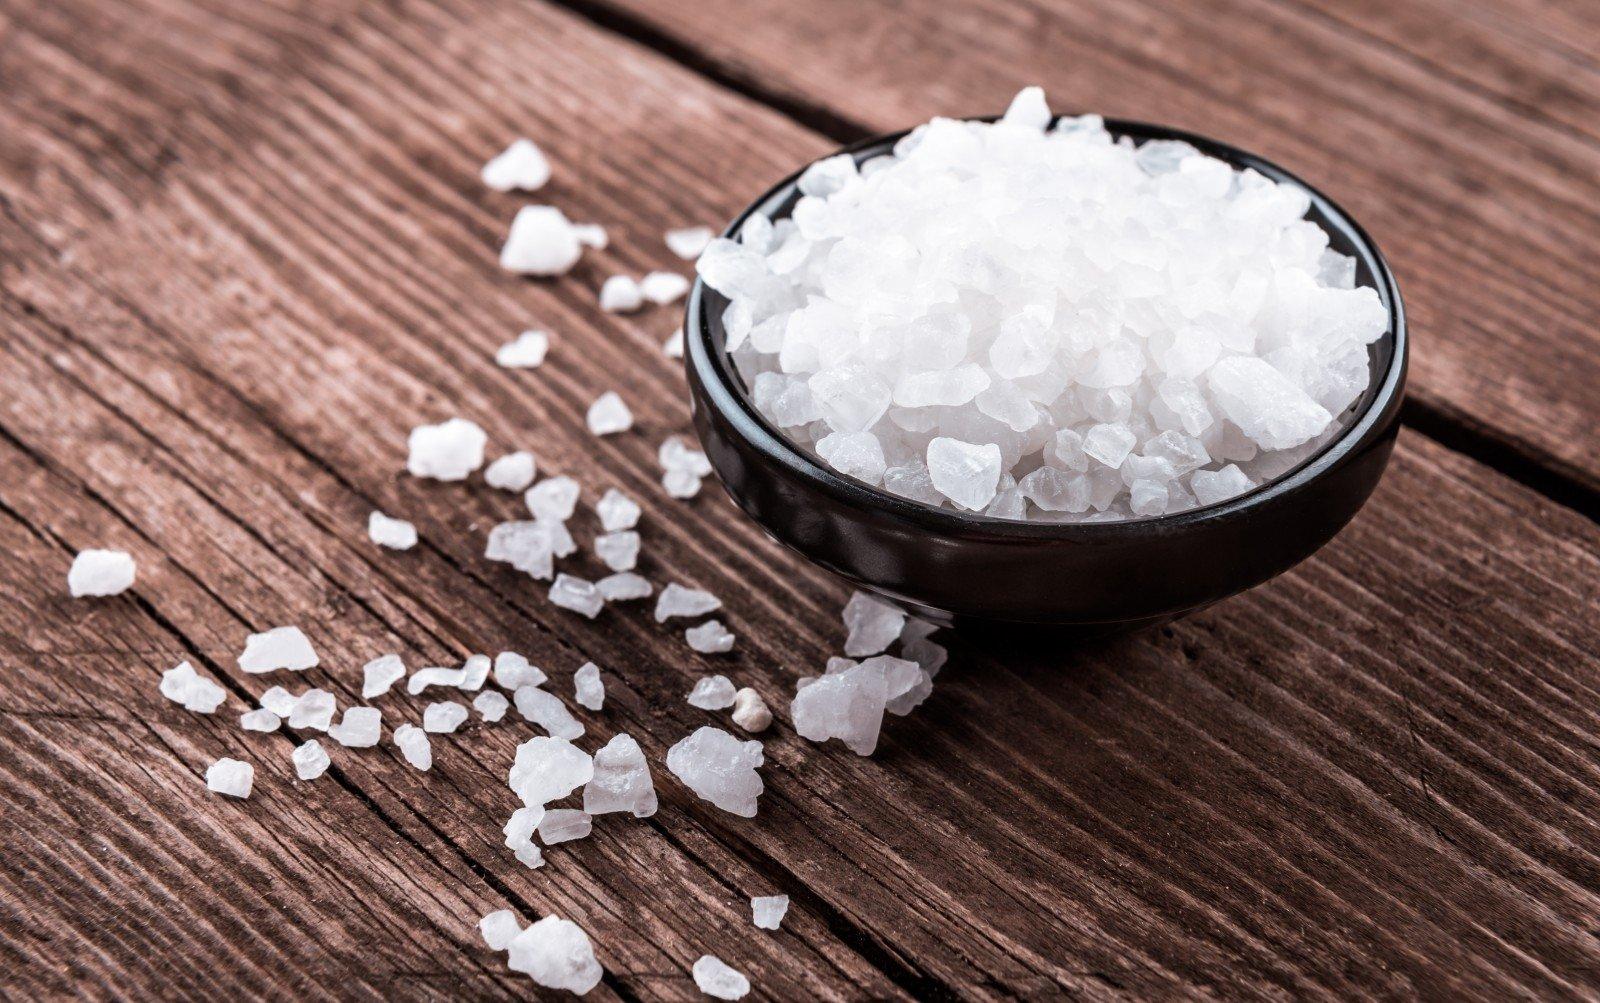 druska gydant hipertenziją